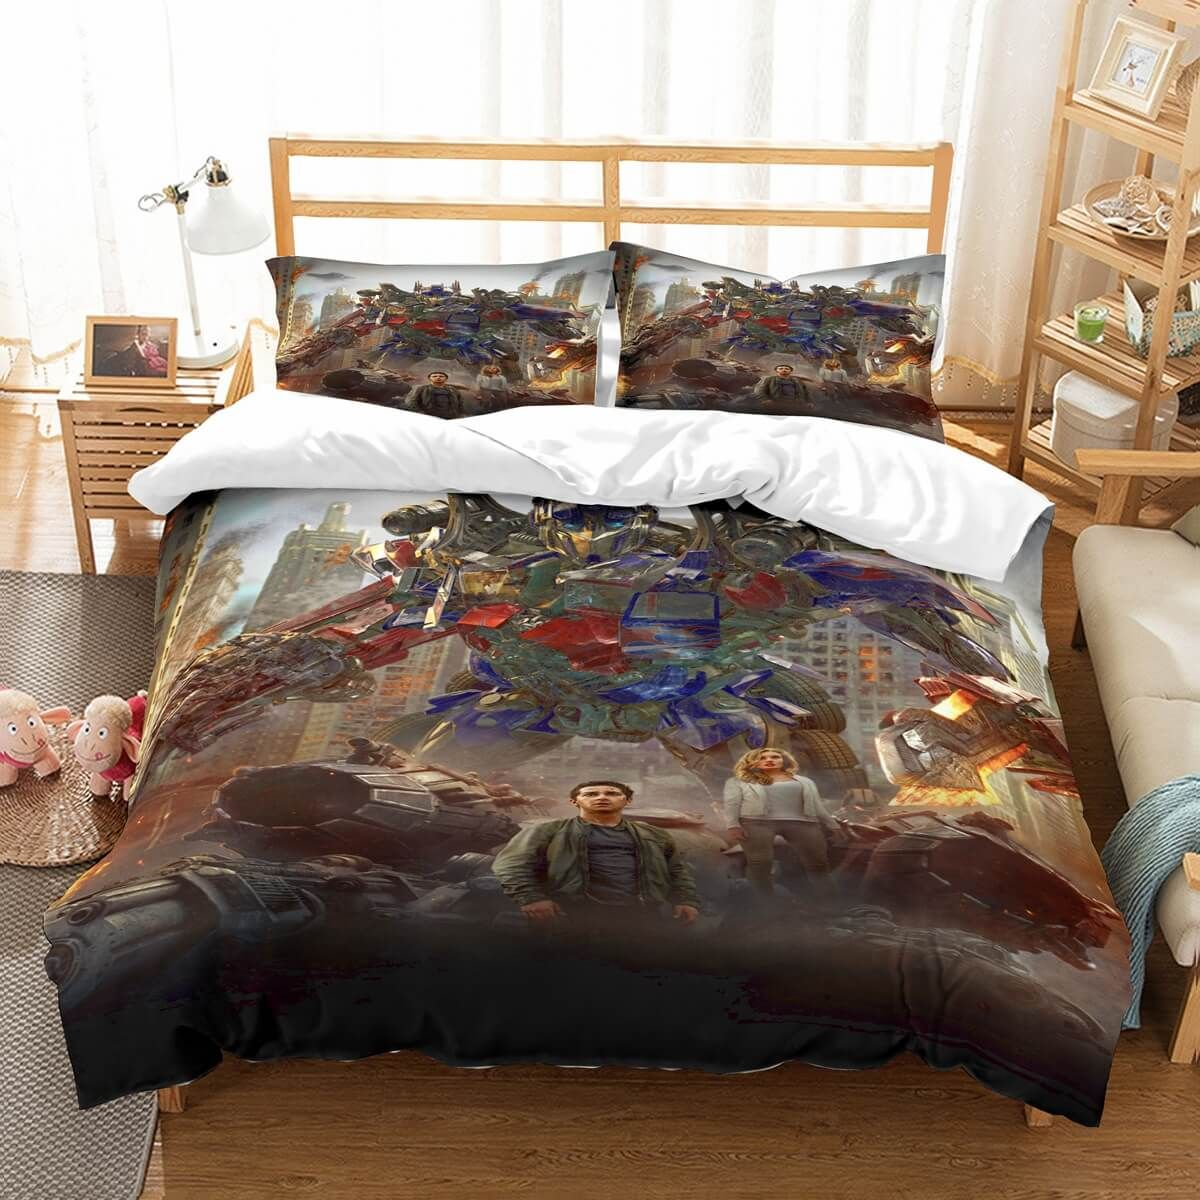 Customize Transformers Bedding Set Duvet Cover Bedroom Bedlinen Sets Linen